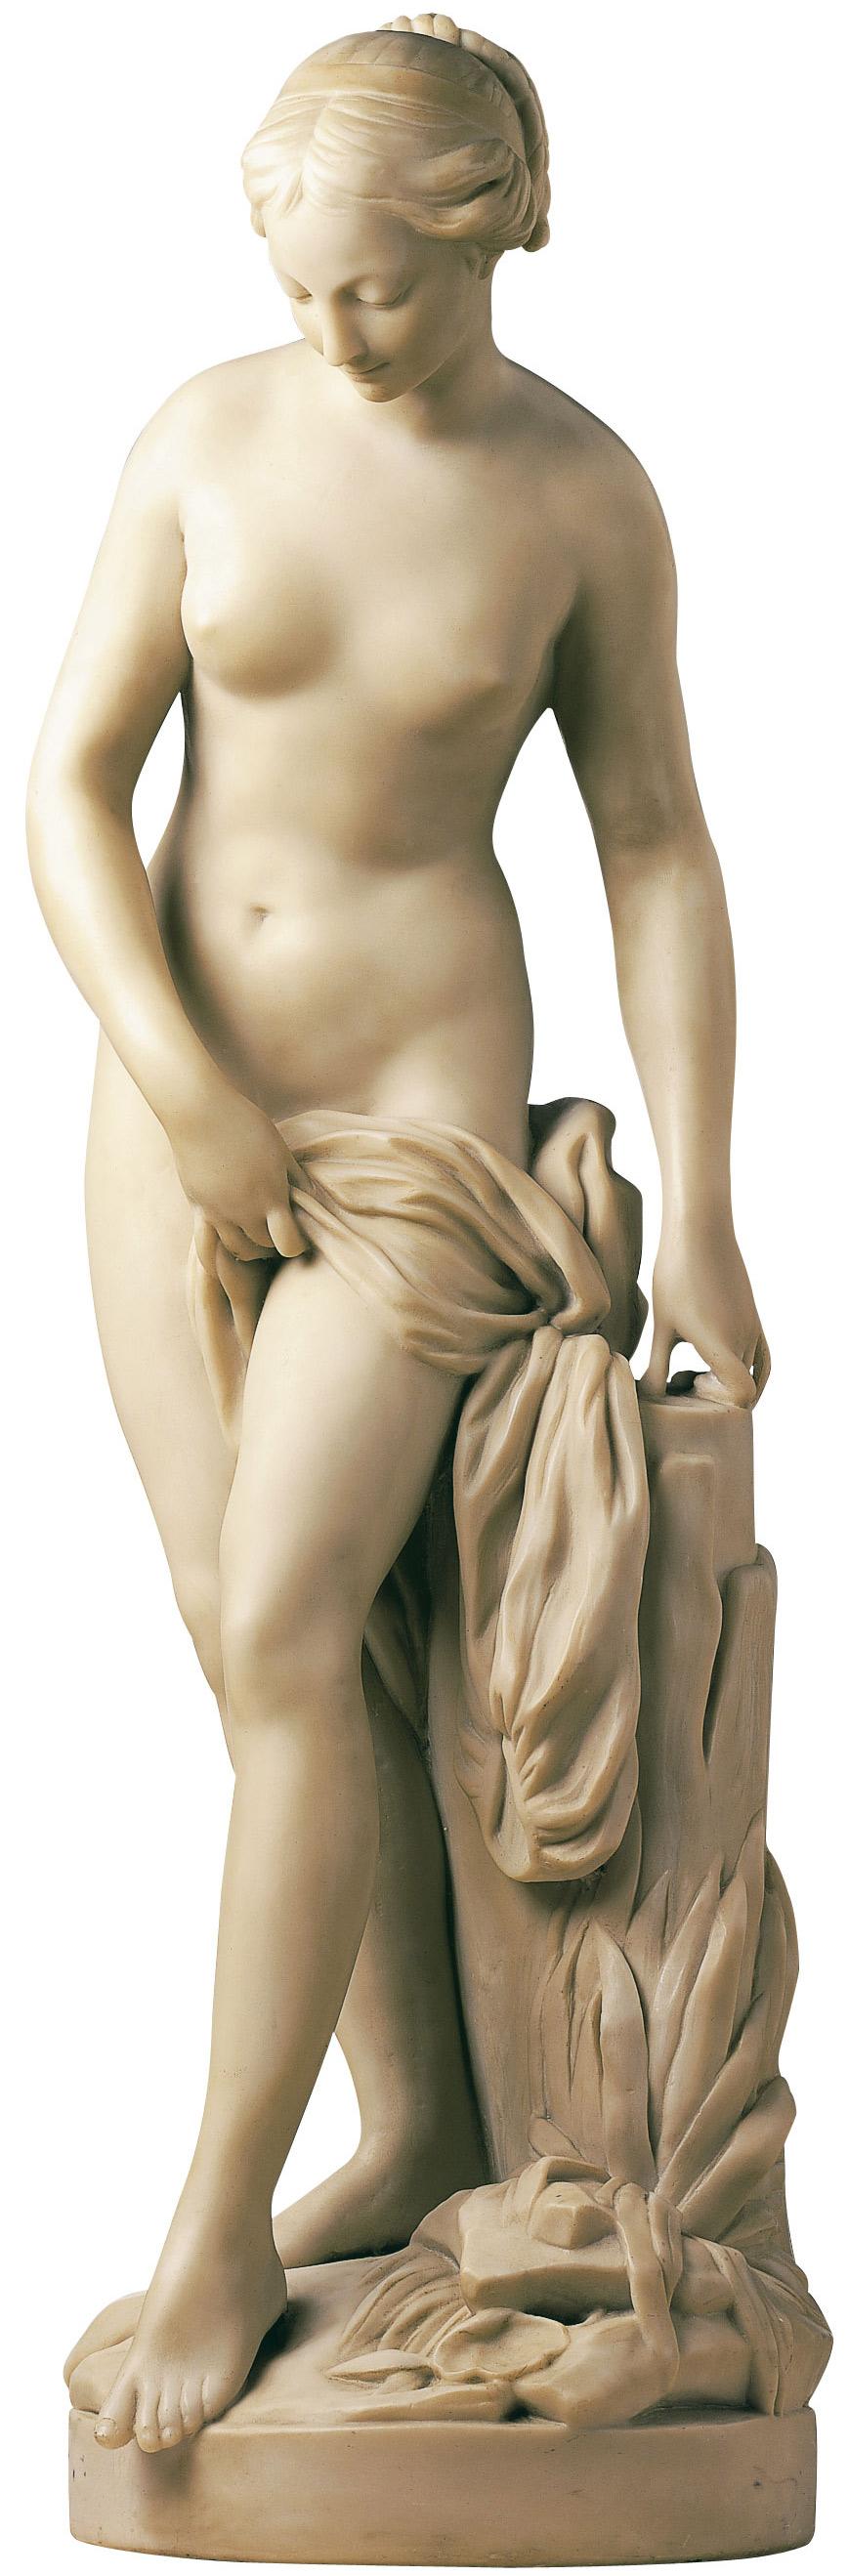 "Skulptur ""Badende"" (Reduktion), Kunstmarmor"